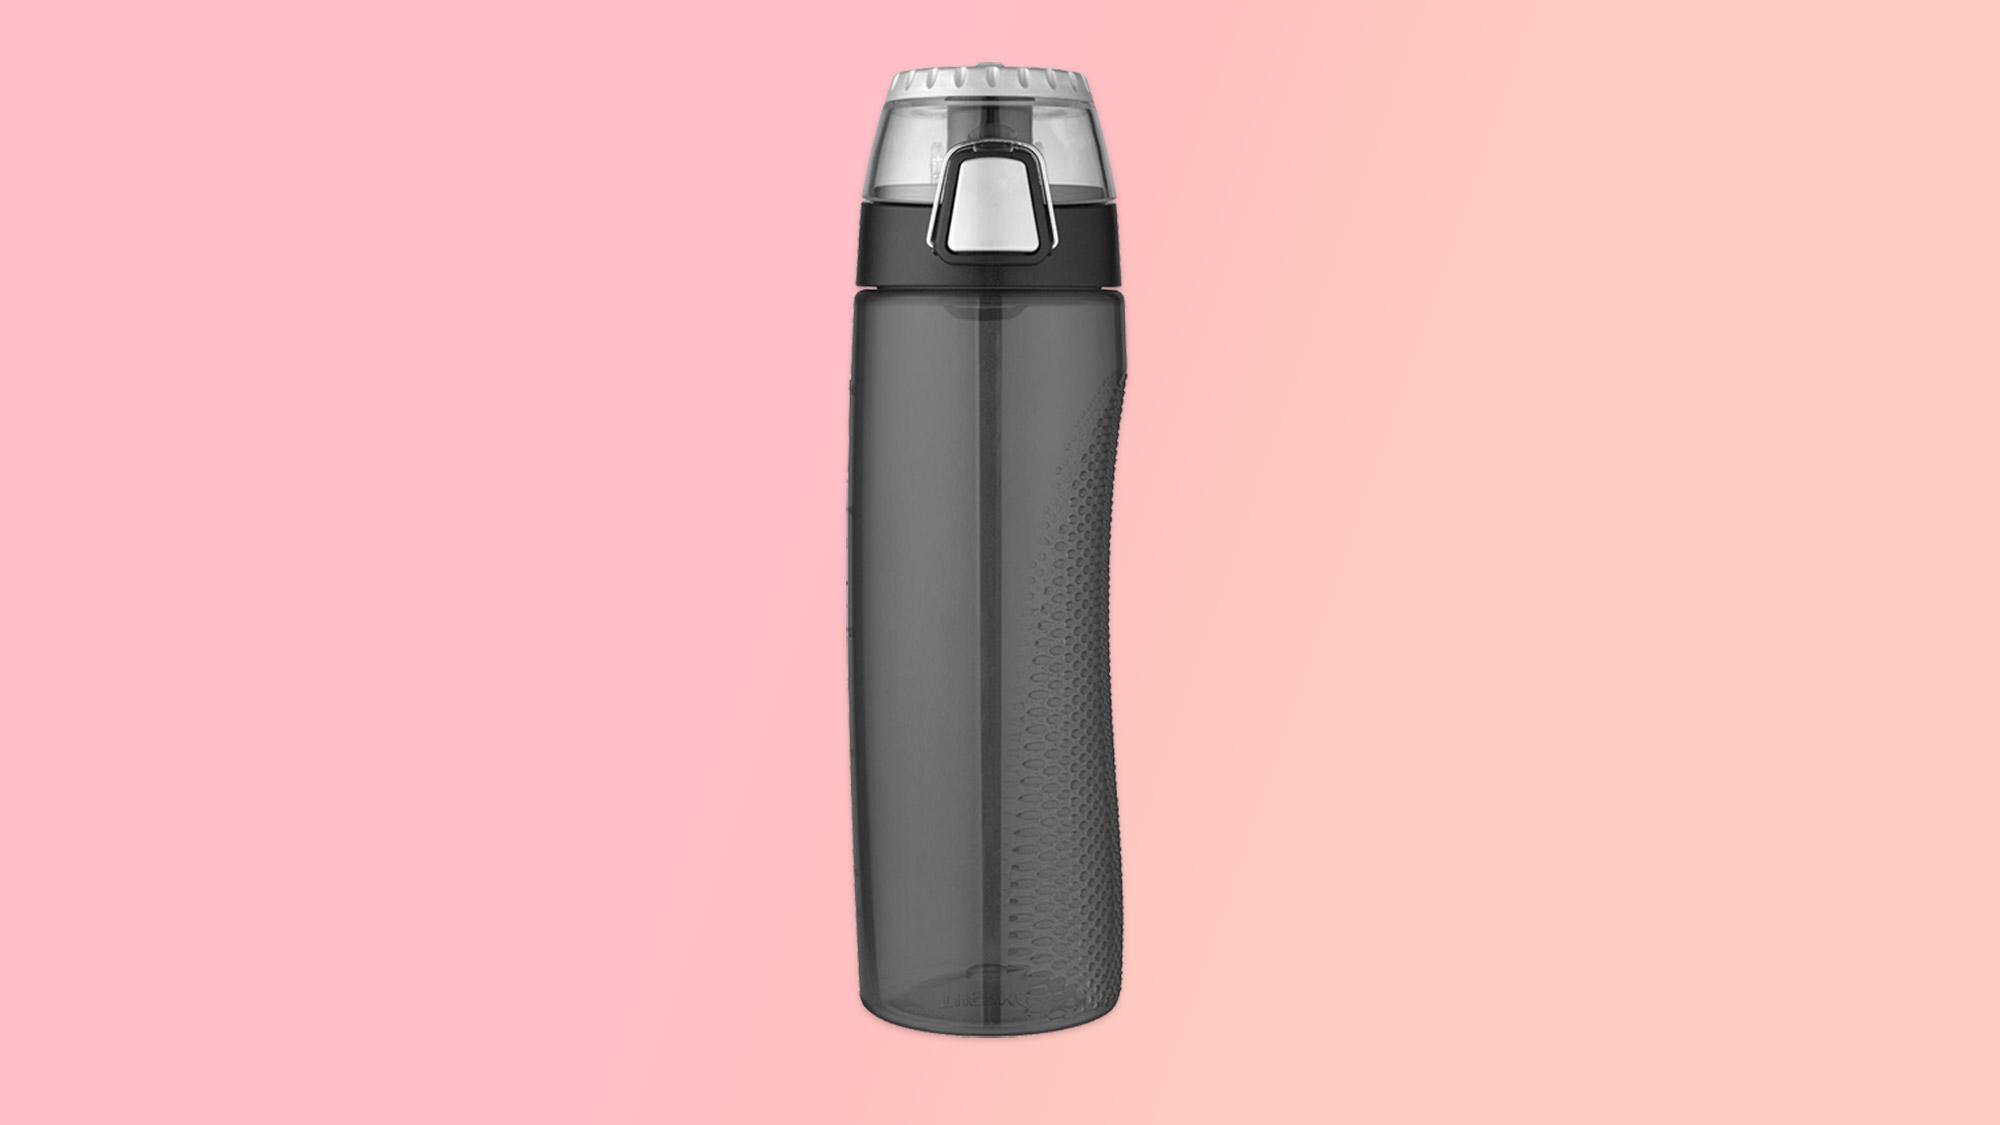 best water bottles: Thermos Hydration bottle